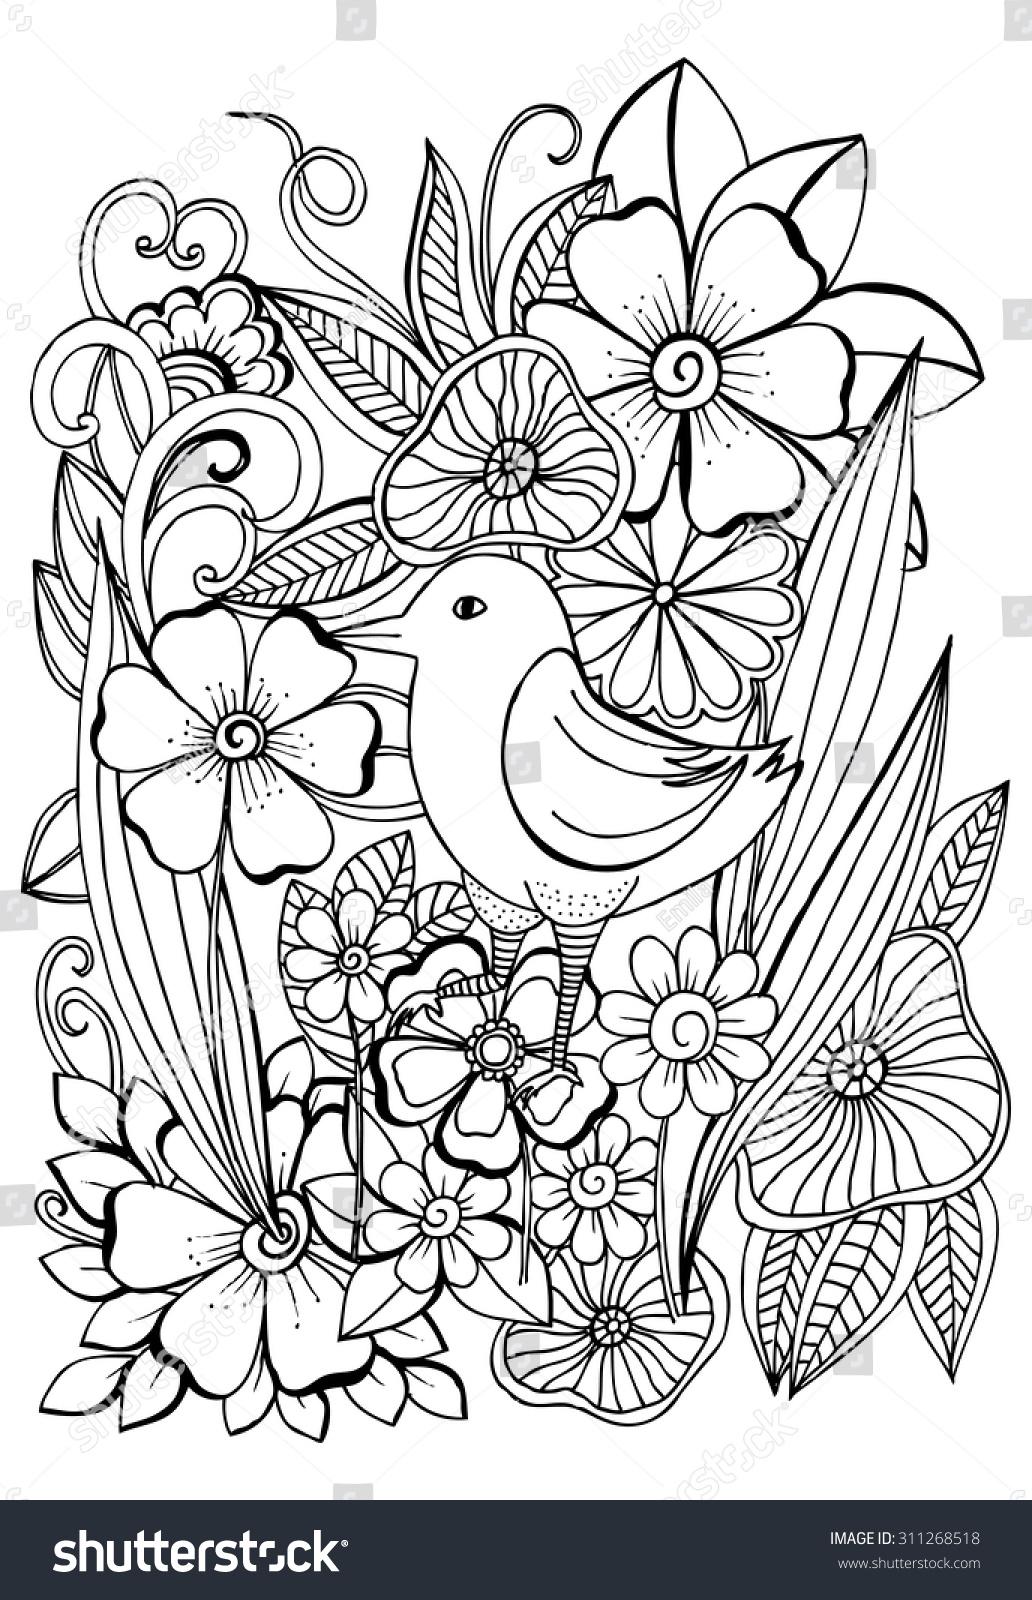 Botanical art coloring book - Beautiful Tropical Bird In Magical Garden For Coloring Book